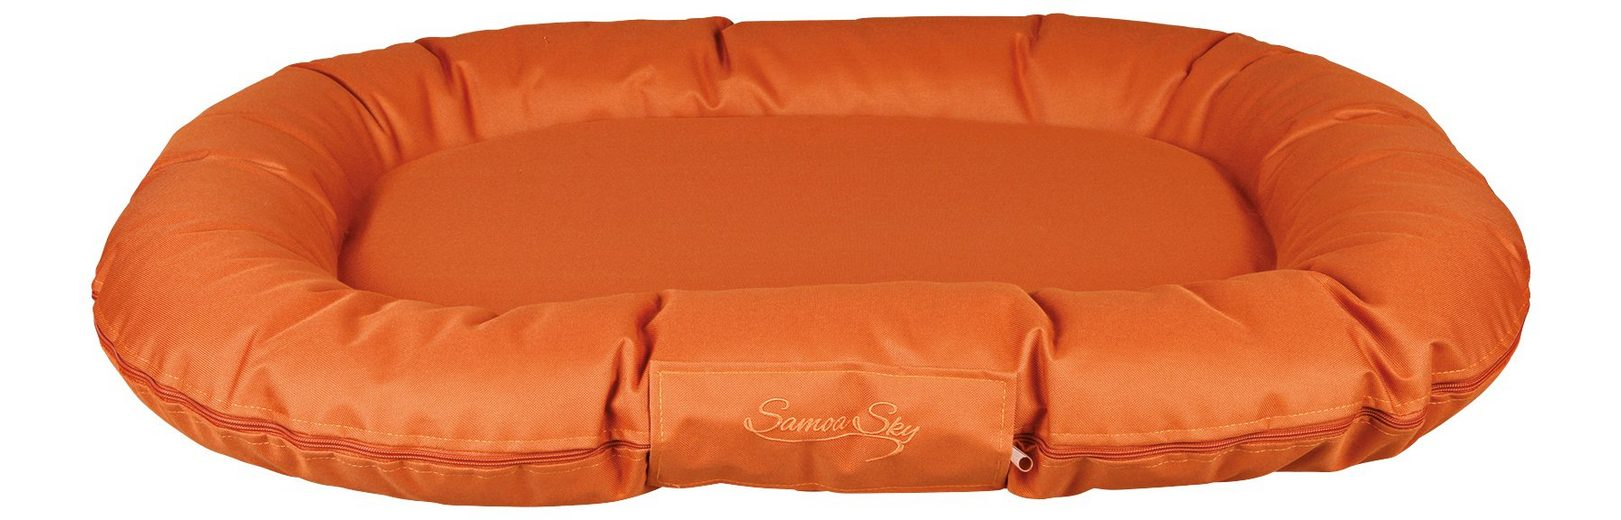 Hundekissen »Samoa Sky«, BxL: 80x60 cm, orange